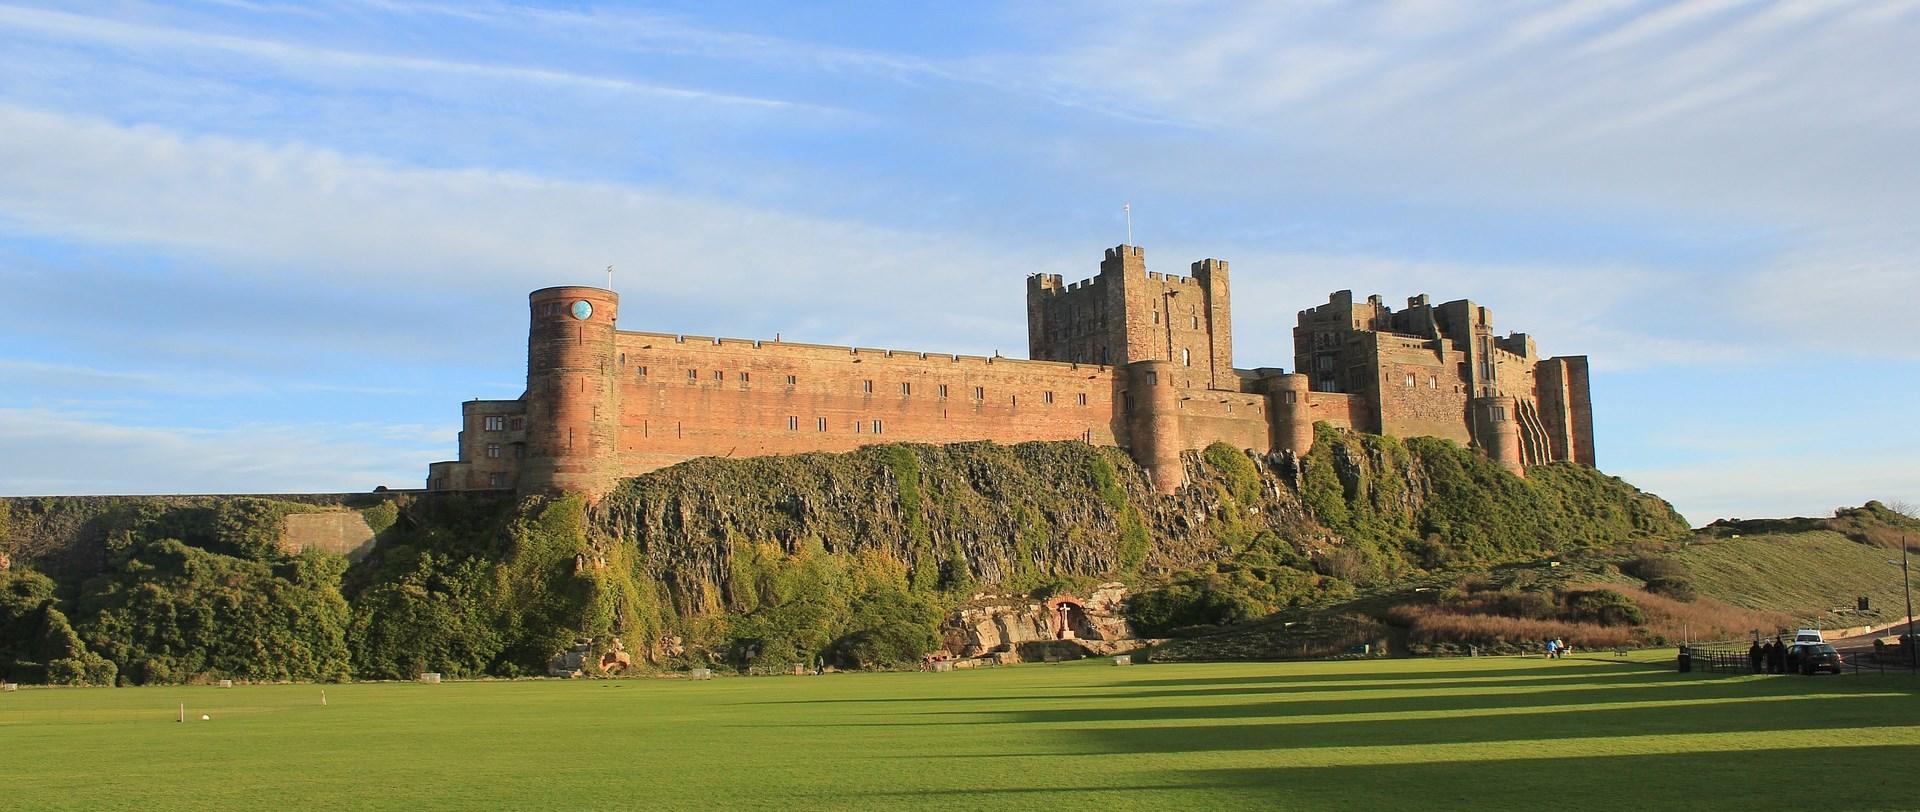 Bamburgh Castle © drhelenmkay | pixabay.com